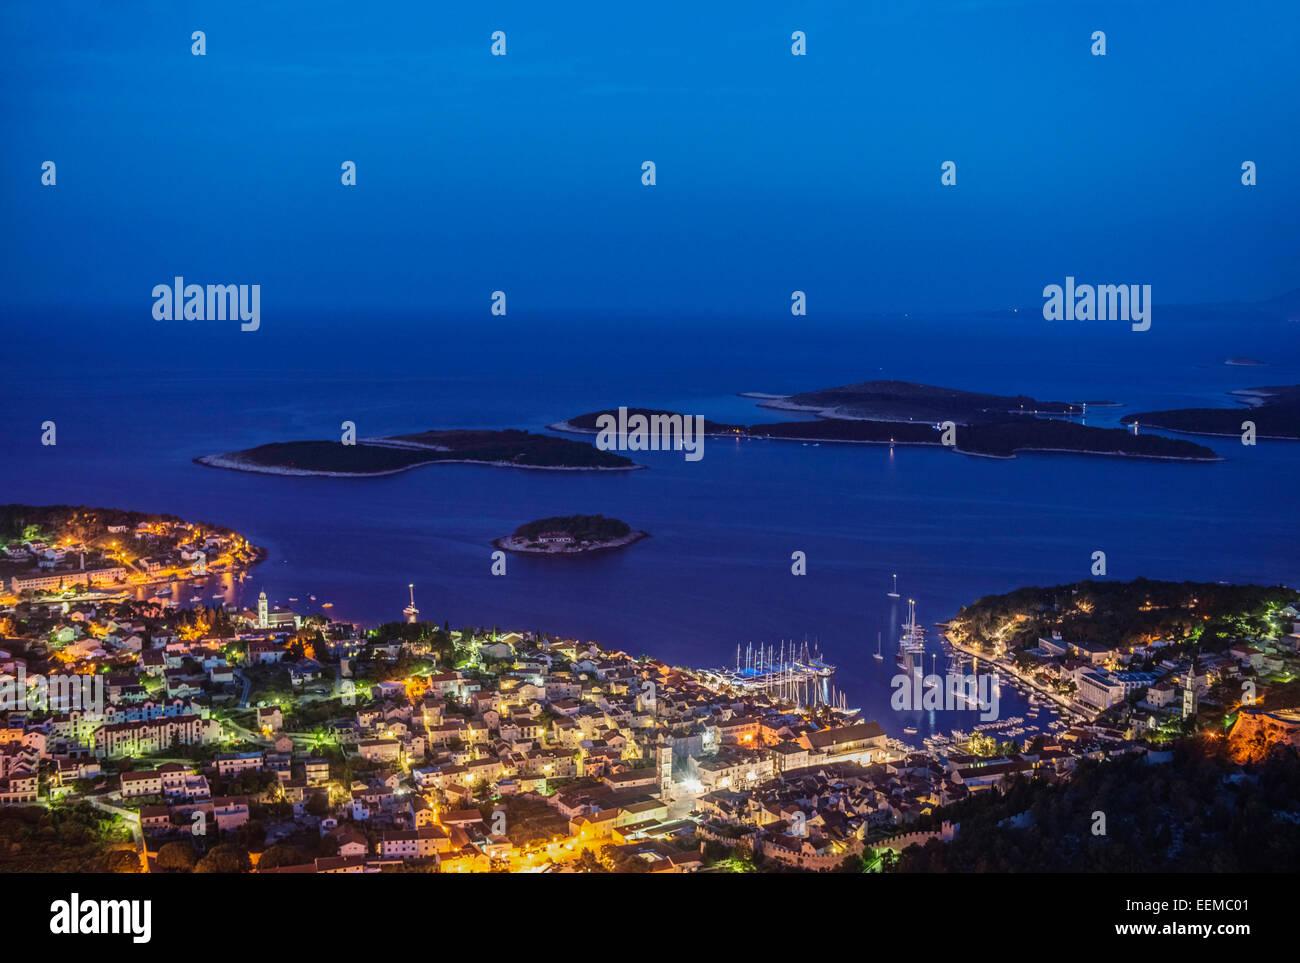 Aerial view of coastal town illuminated at night - Stock Image